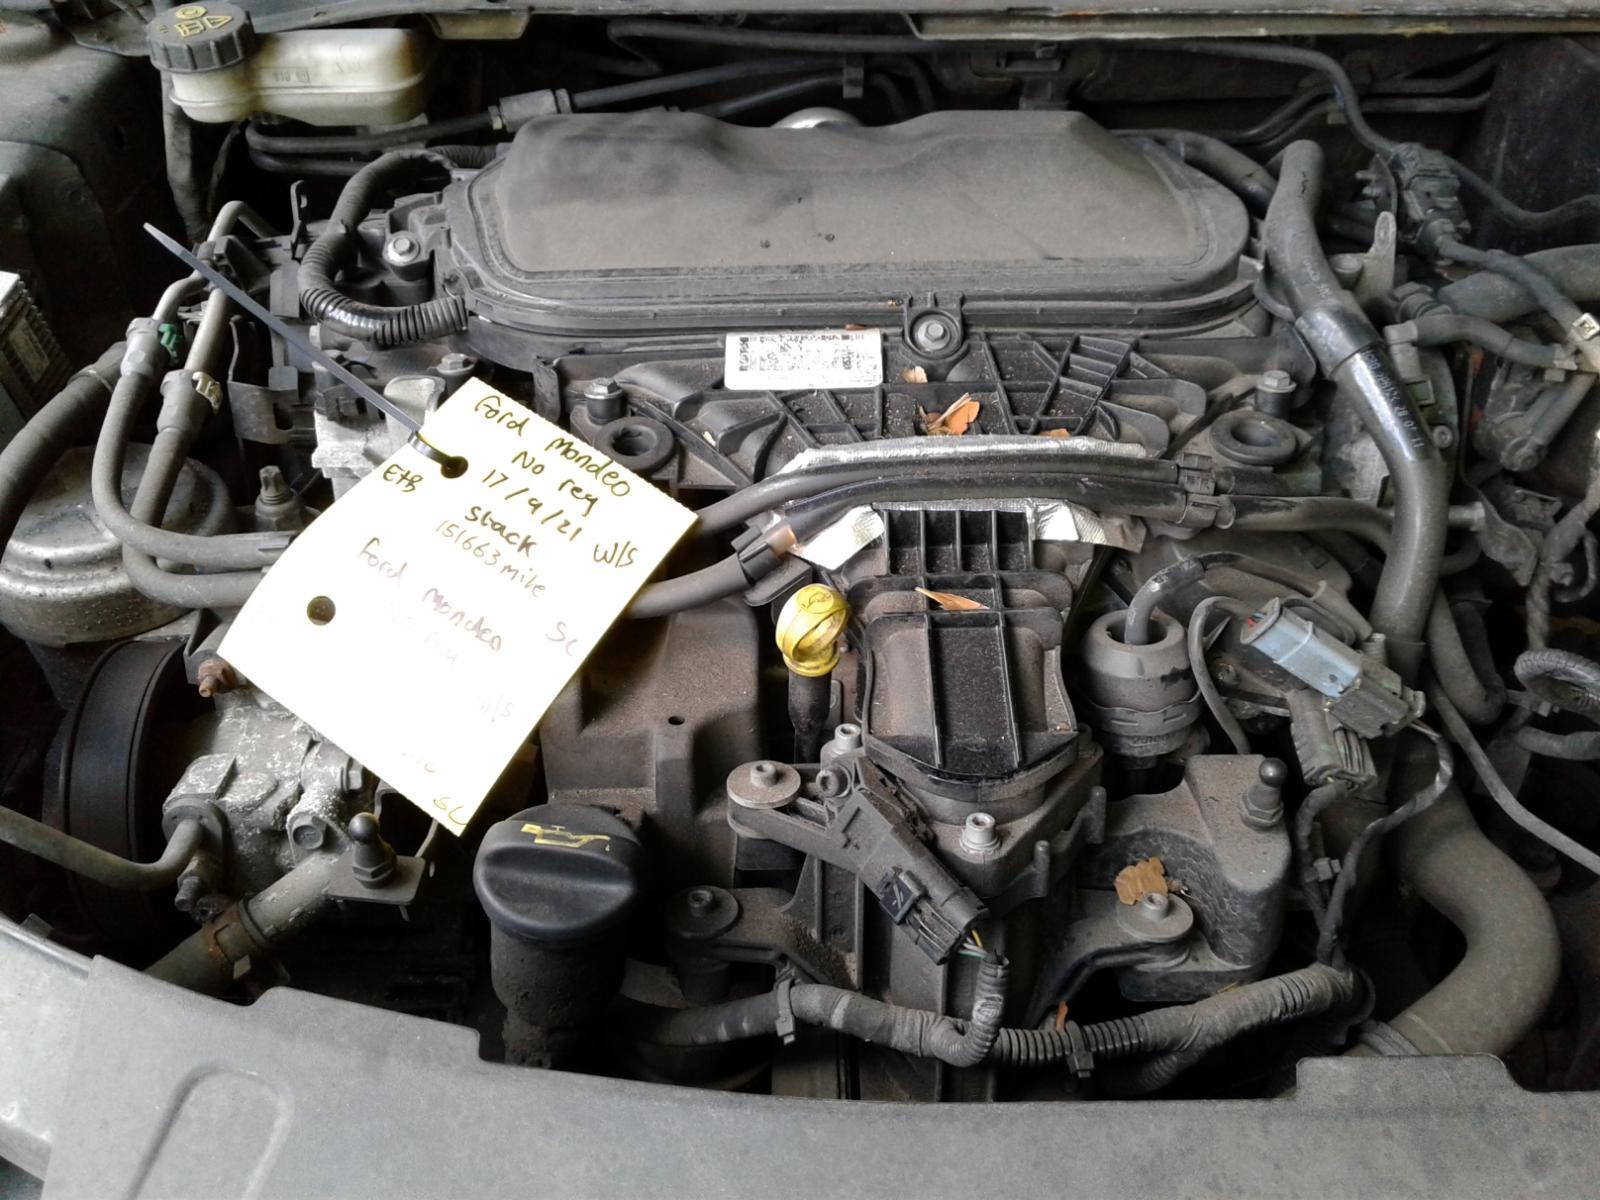 Image for a FORD MONDEO 2011 5 Door Hatchback